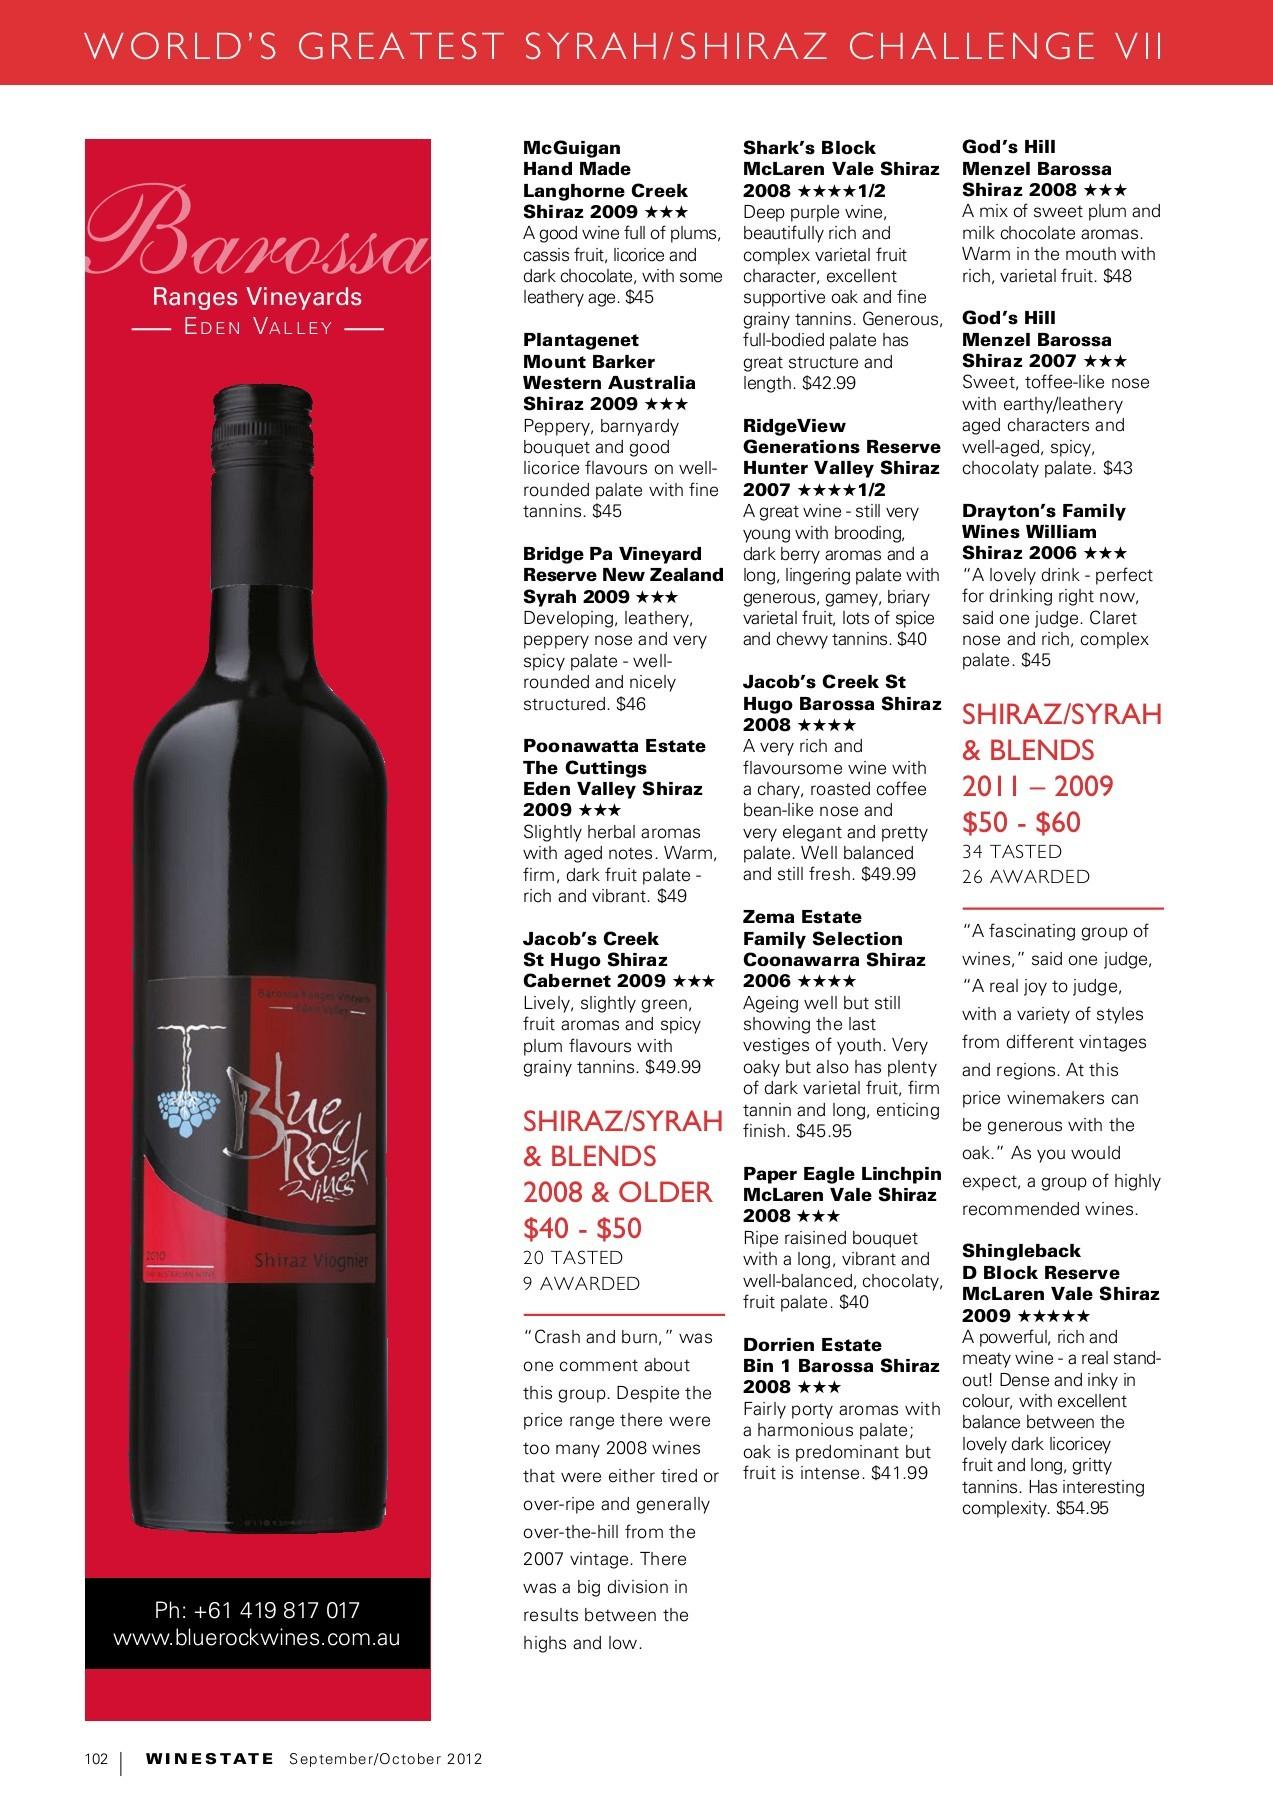 Winestate Magazine September October 2012 Flip Book Pages 101 150 Pubhtml5